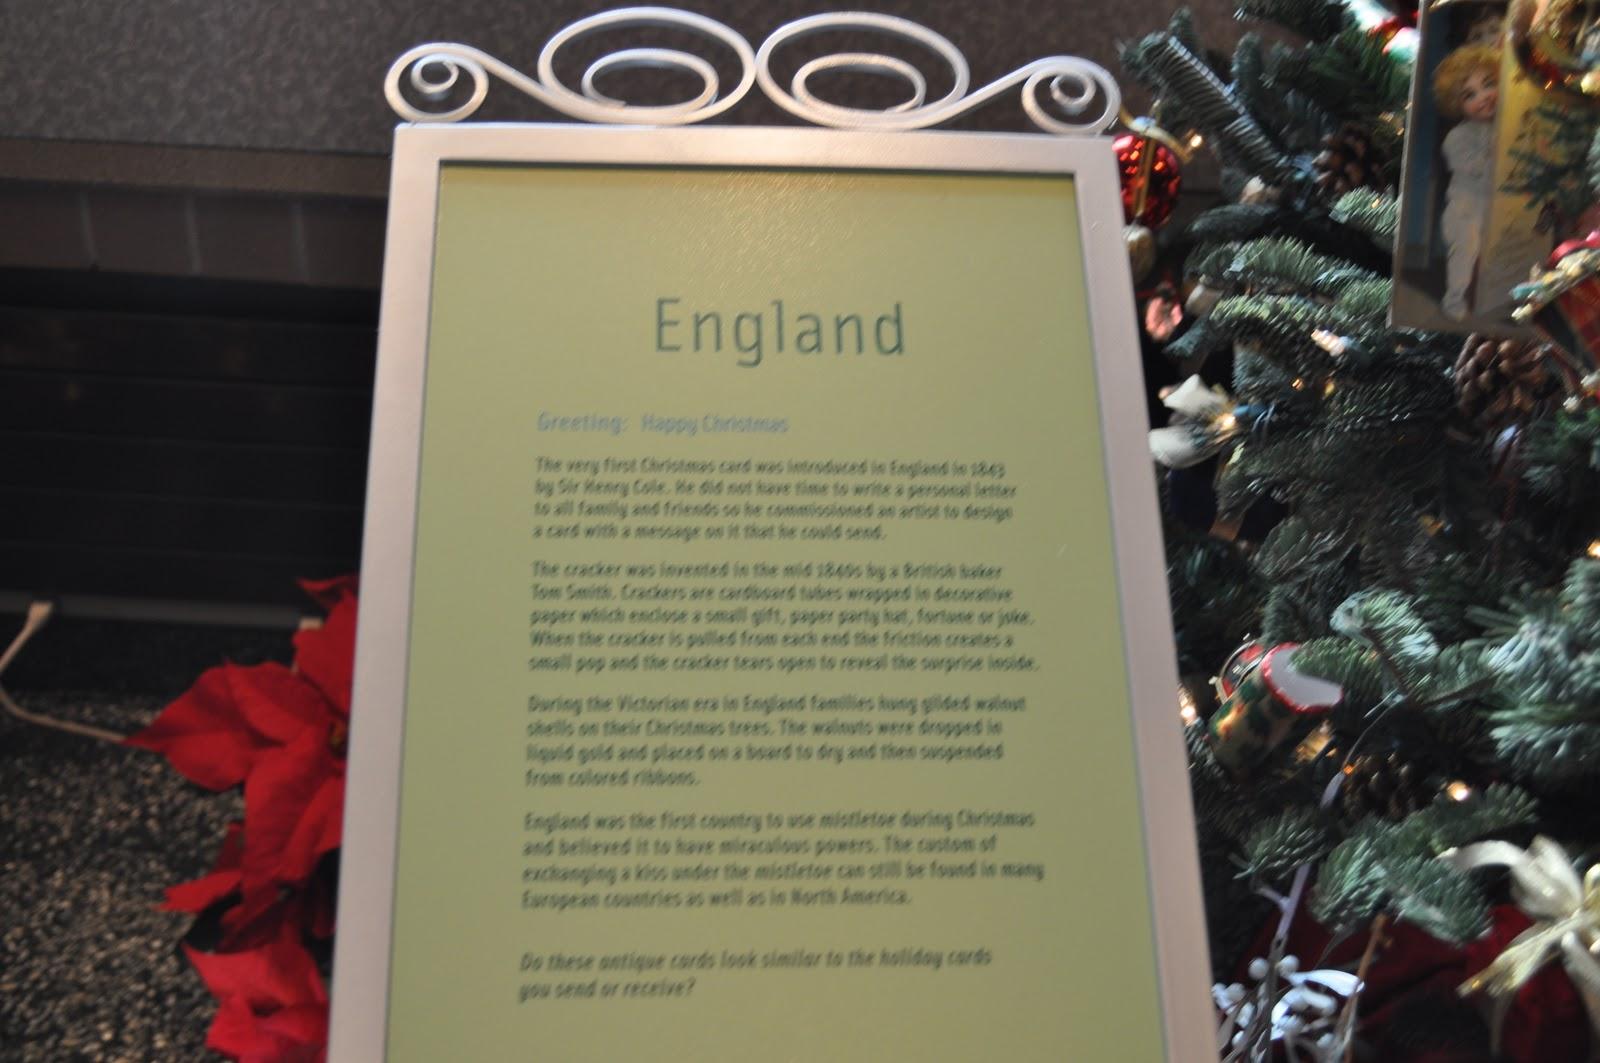 Michigan Cottage Cook: ENGLAND, SLOVAK REPUBLIC AND SWITERLAND ...